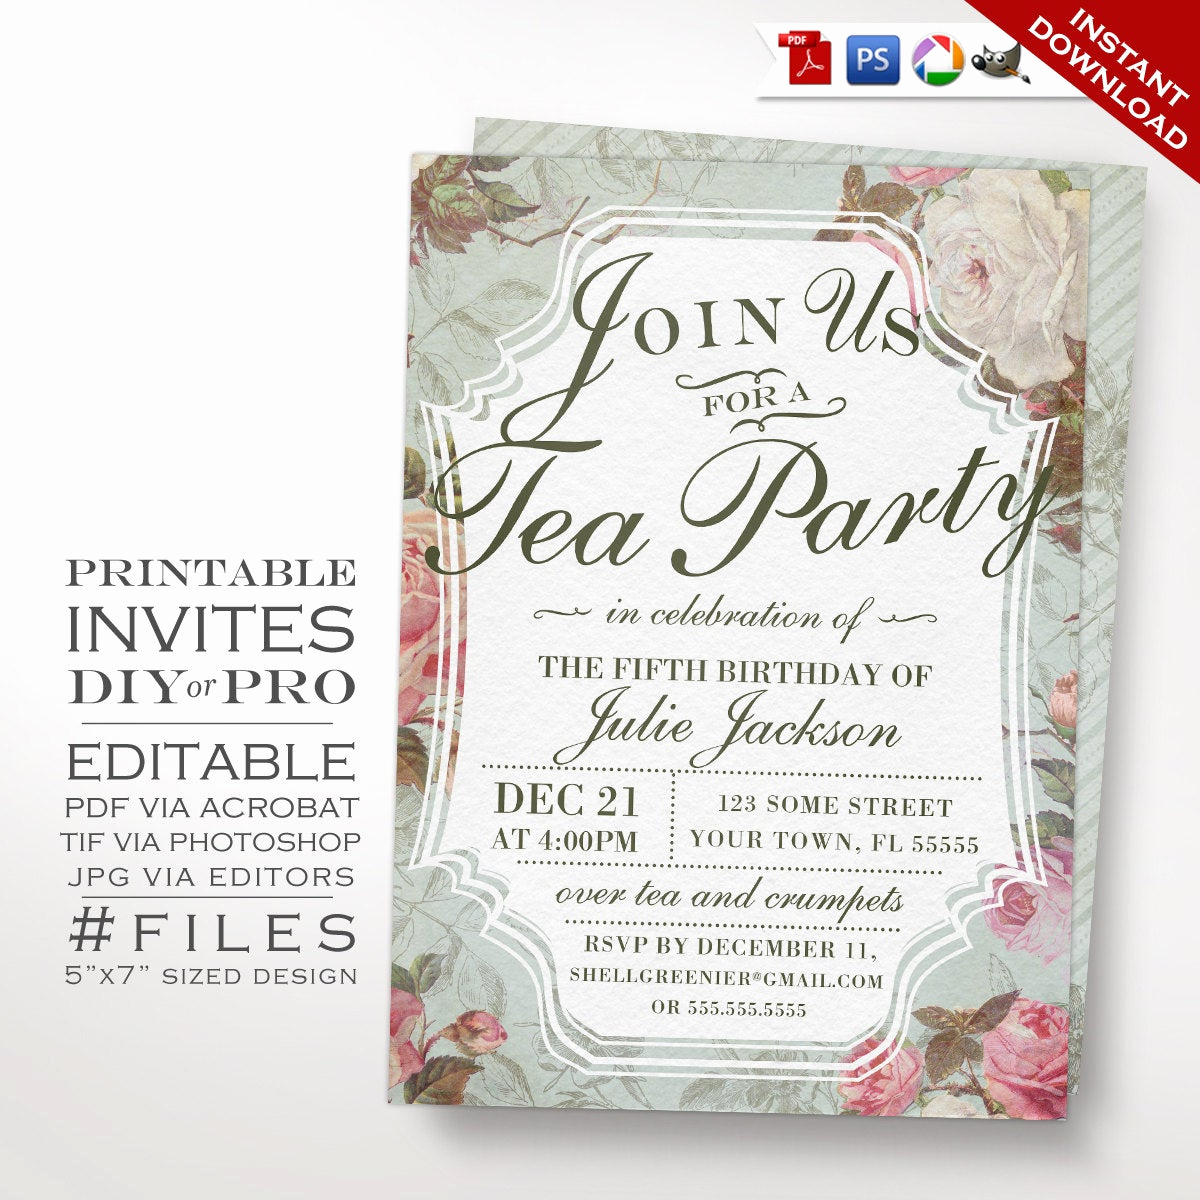 Tea Party Invitation Templates Inspirational Birthday Tea Party Invitation Template Vintage Rose Tea